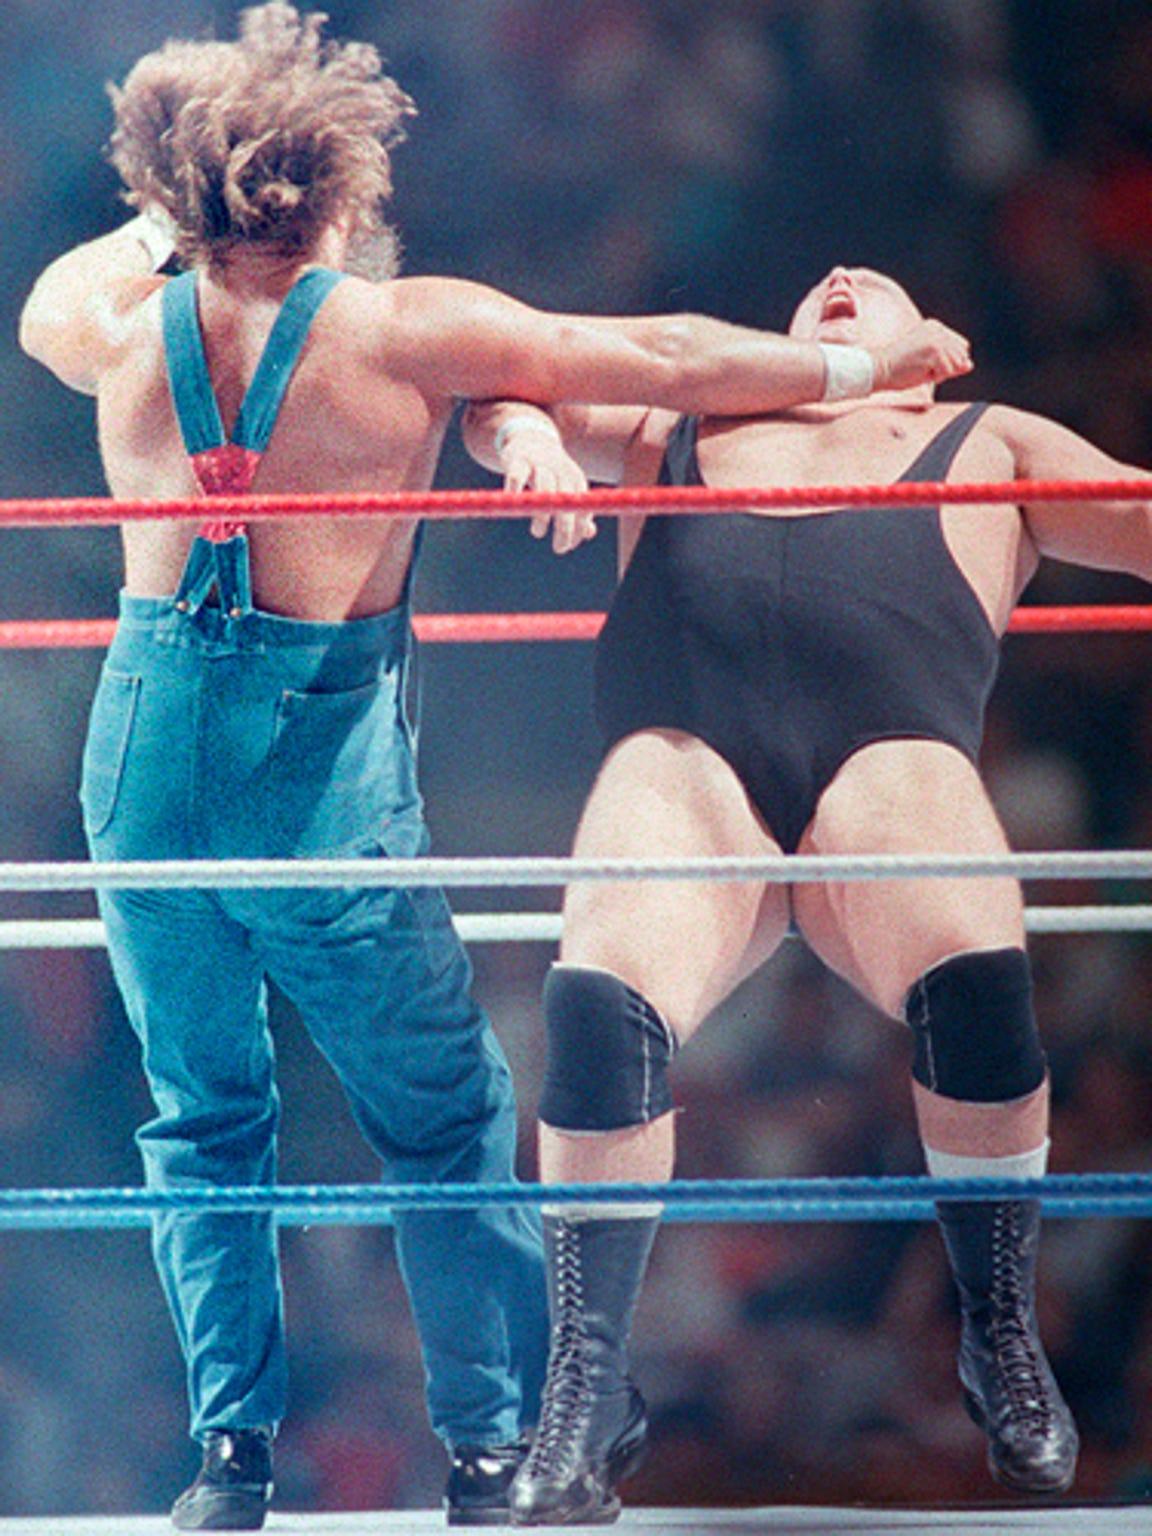 Christopher Pallies, AKA professional wrestler King